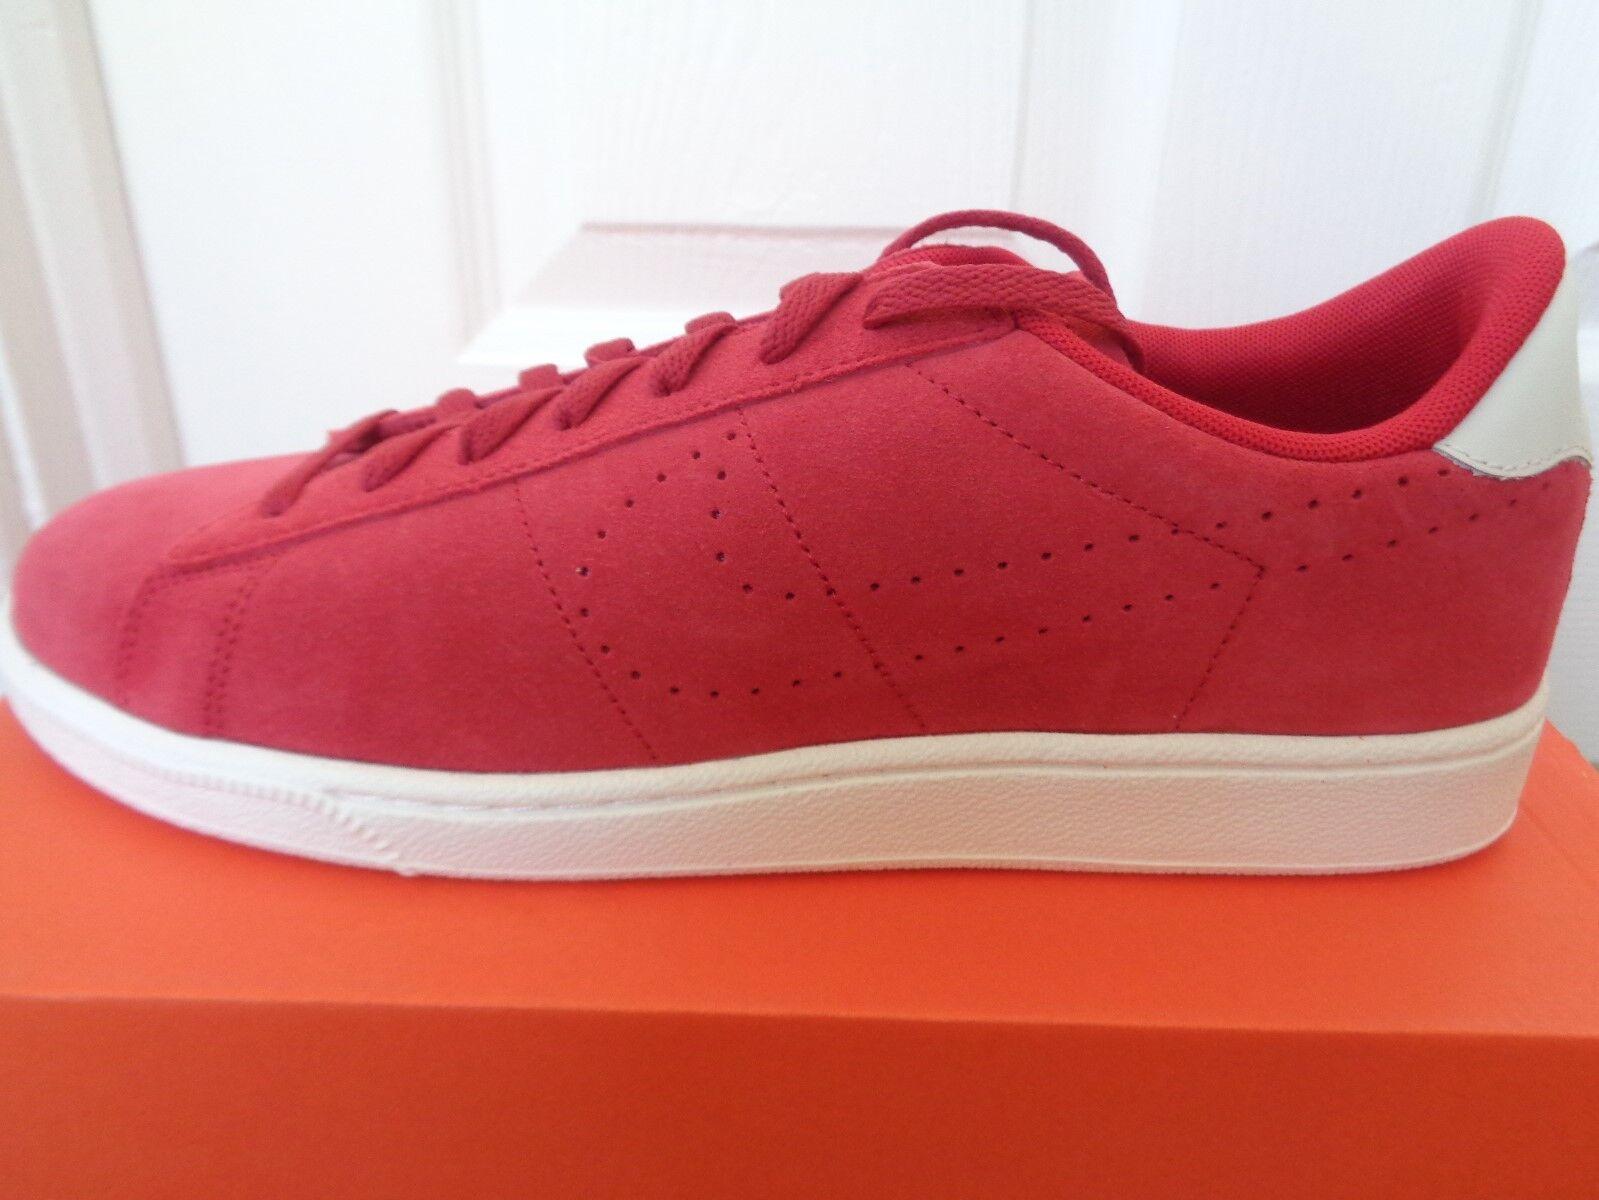 Nike Tennis classic CS Suede trainers trainers trainers schuhe 829351 600 uk 9 eu 44 us 10 NEW+BOX  0e05e2